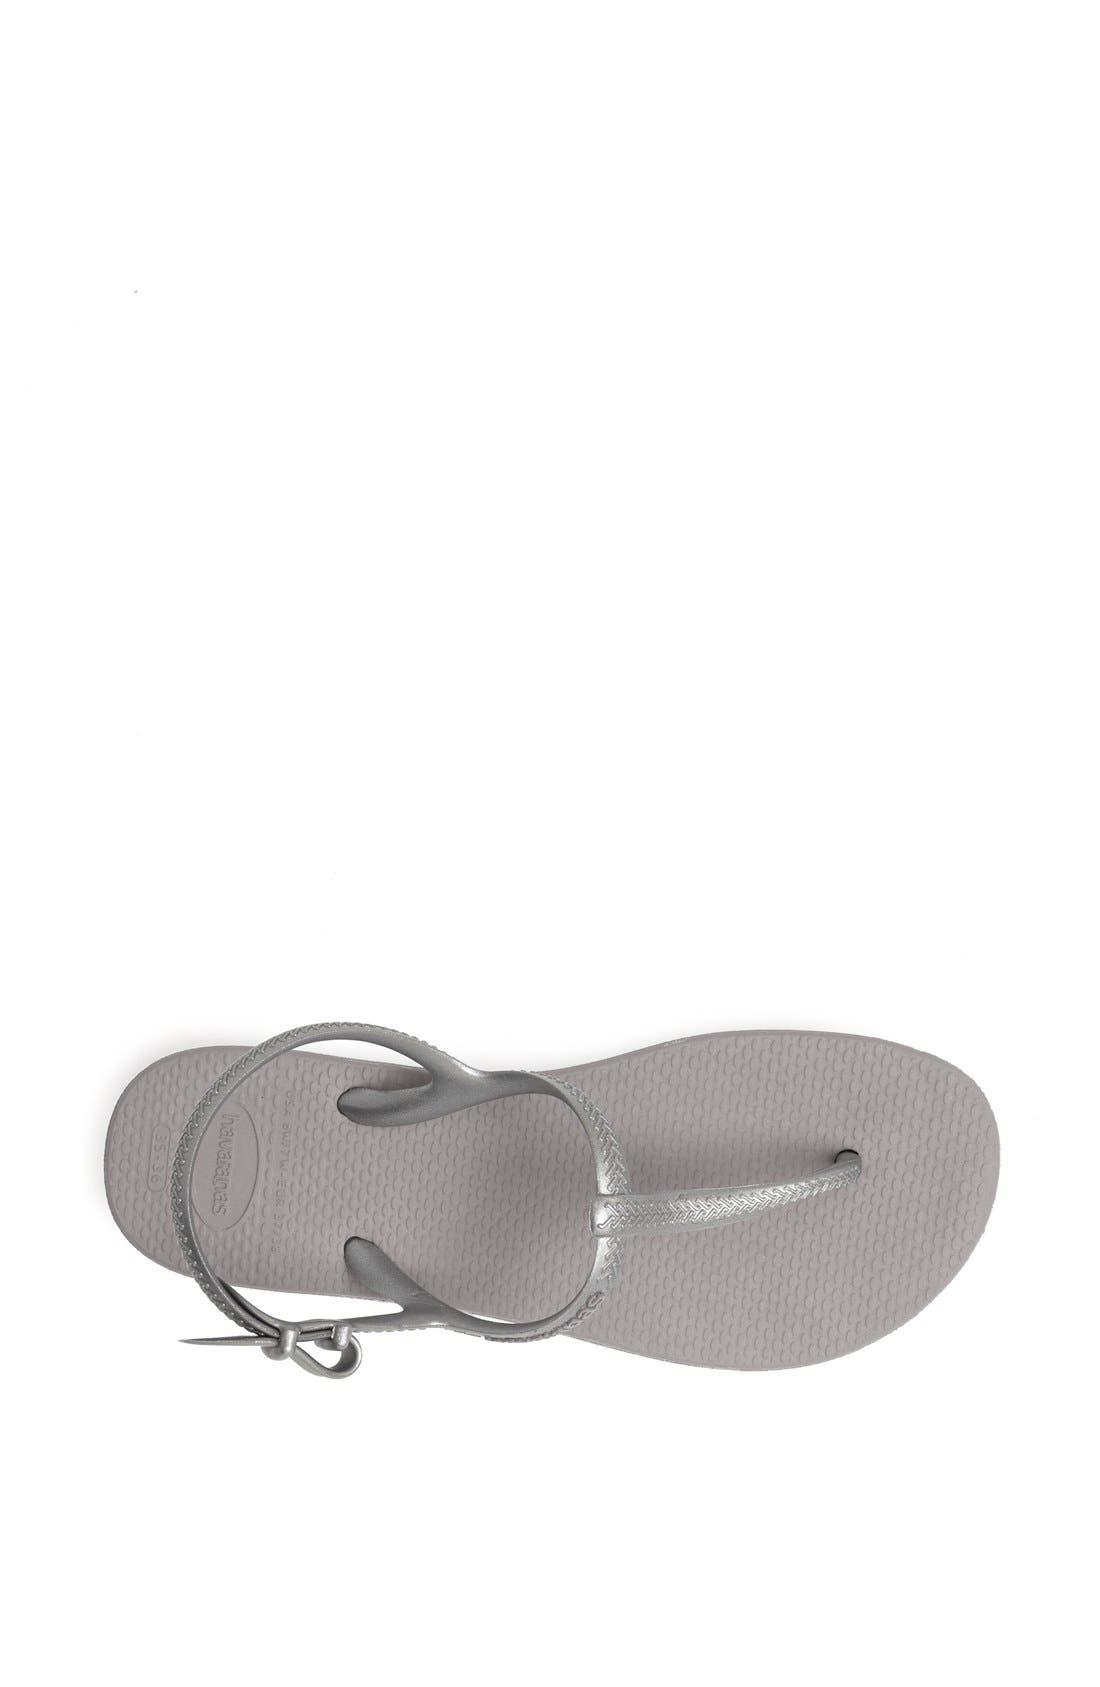 Alternate Image 3  - Havaianas 'Freedom' T-Strap Sandal